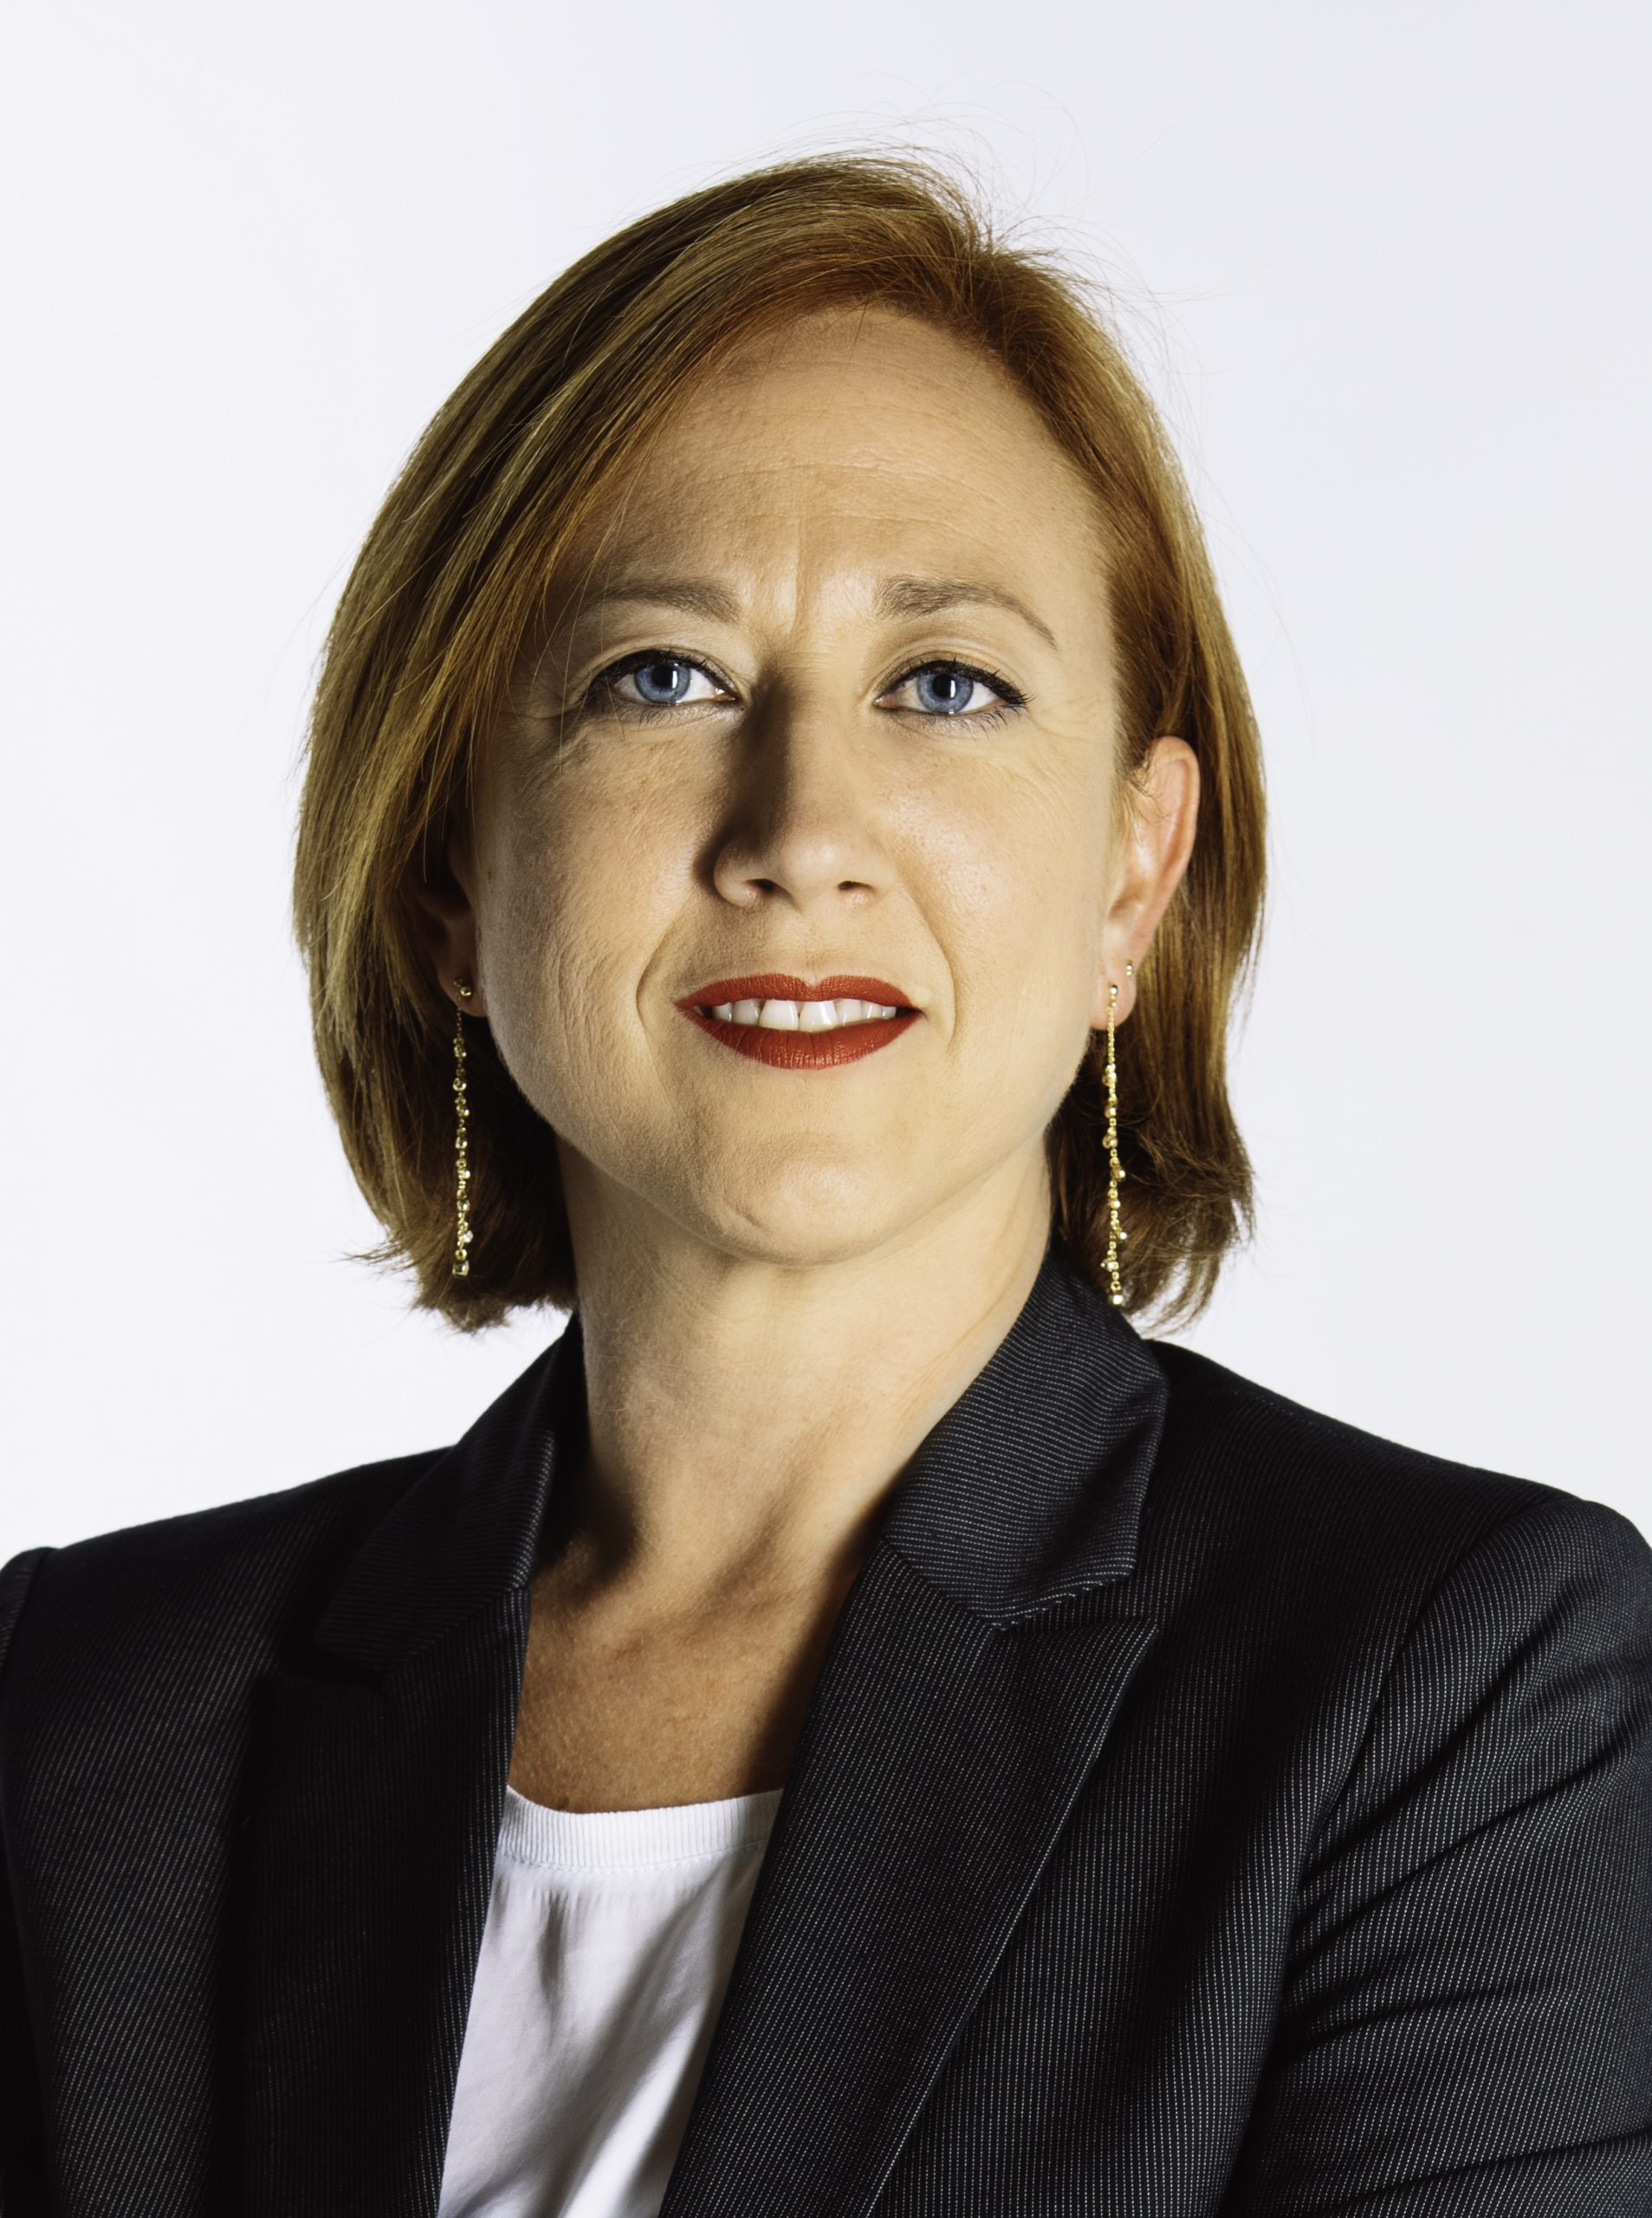 Grela Barreiro, Raquel